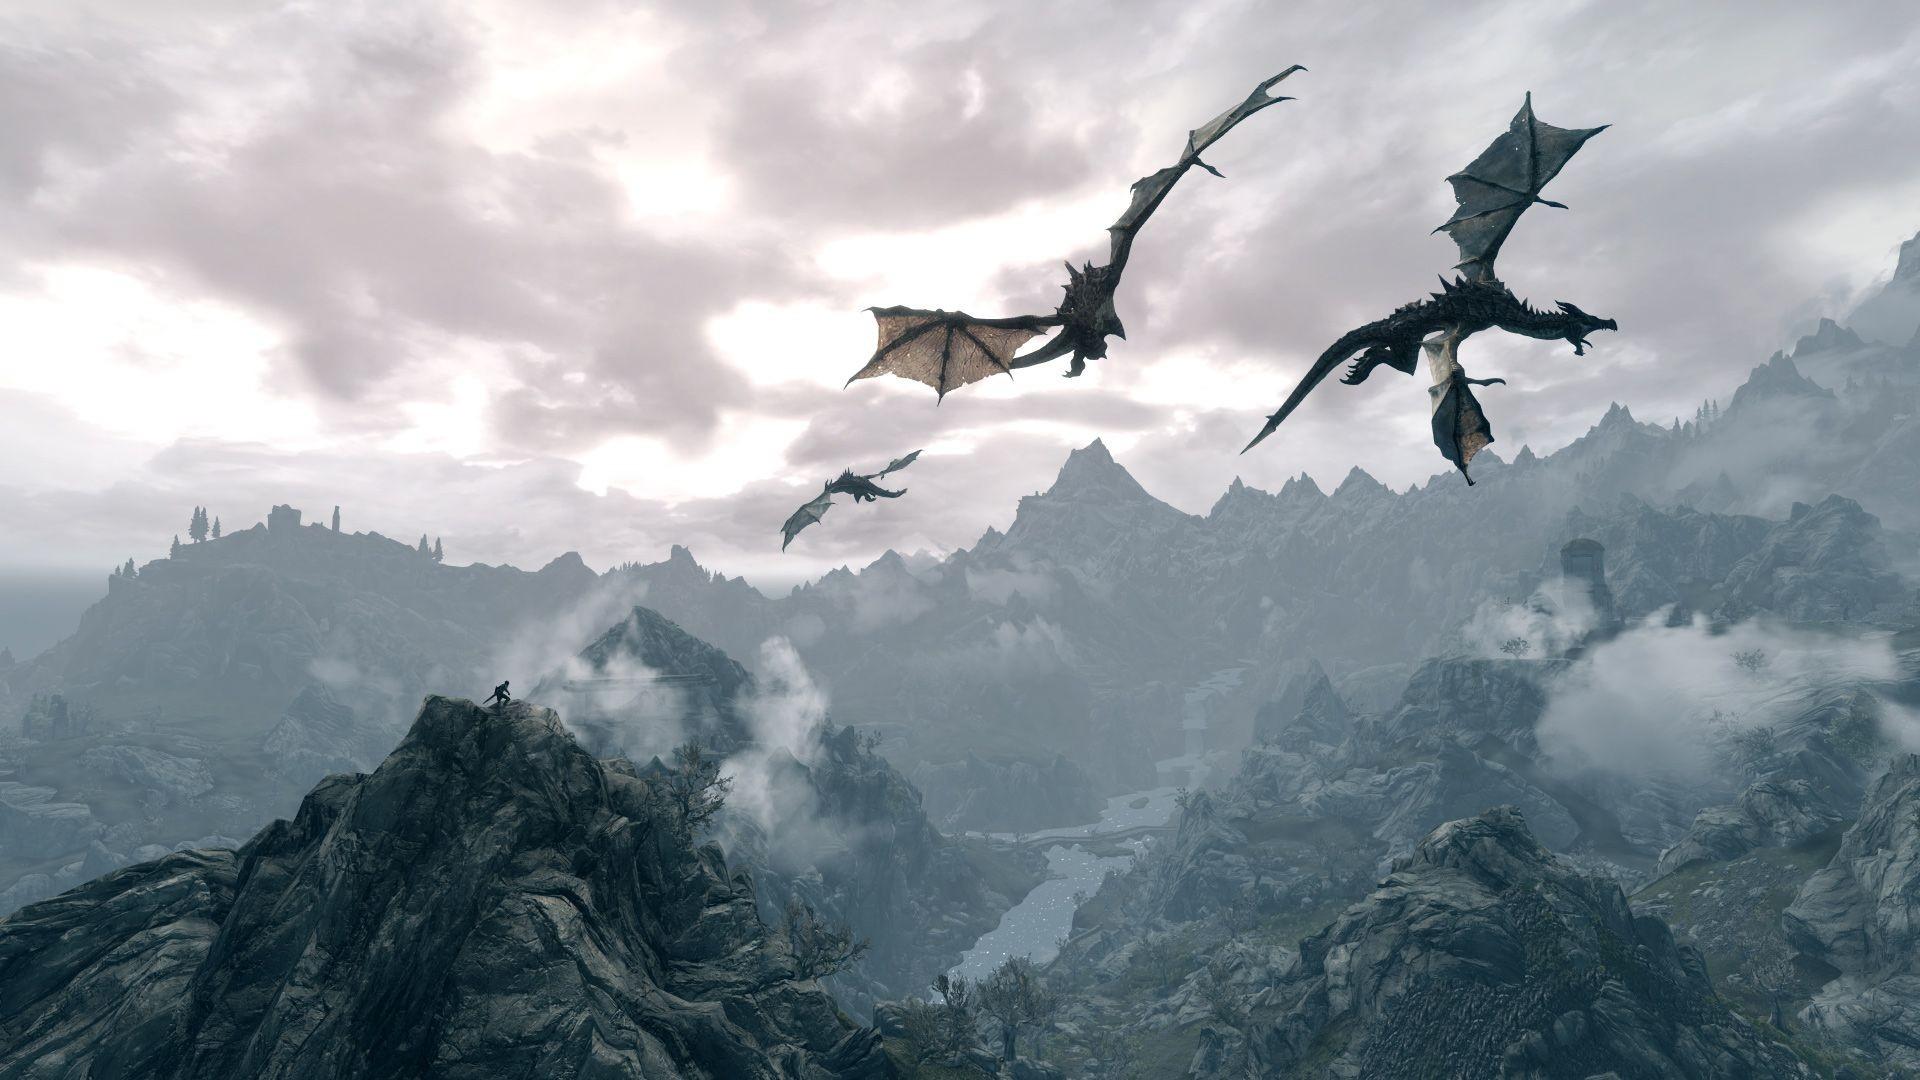 Dragon Hd Wallpapers 1080p